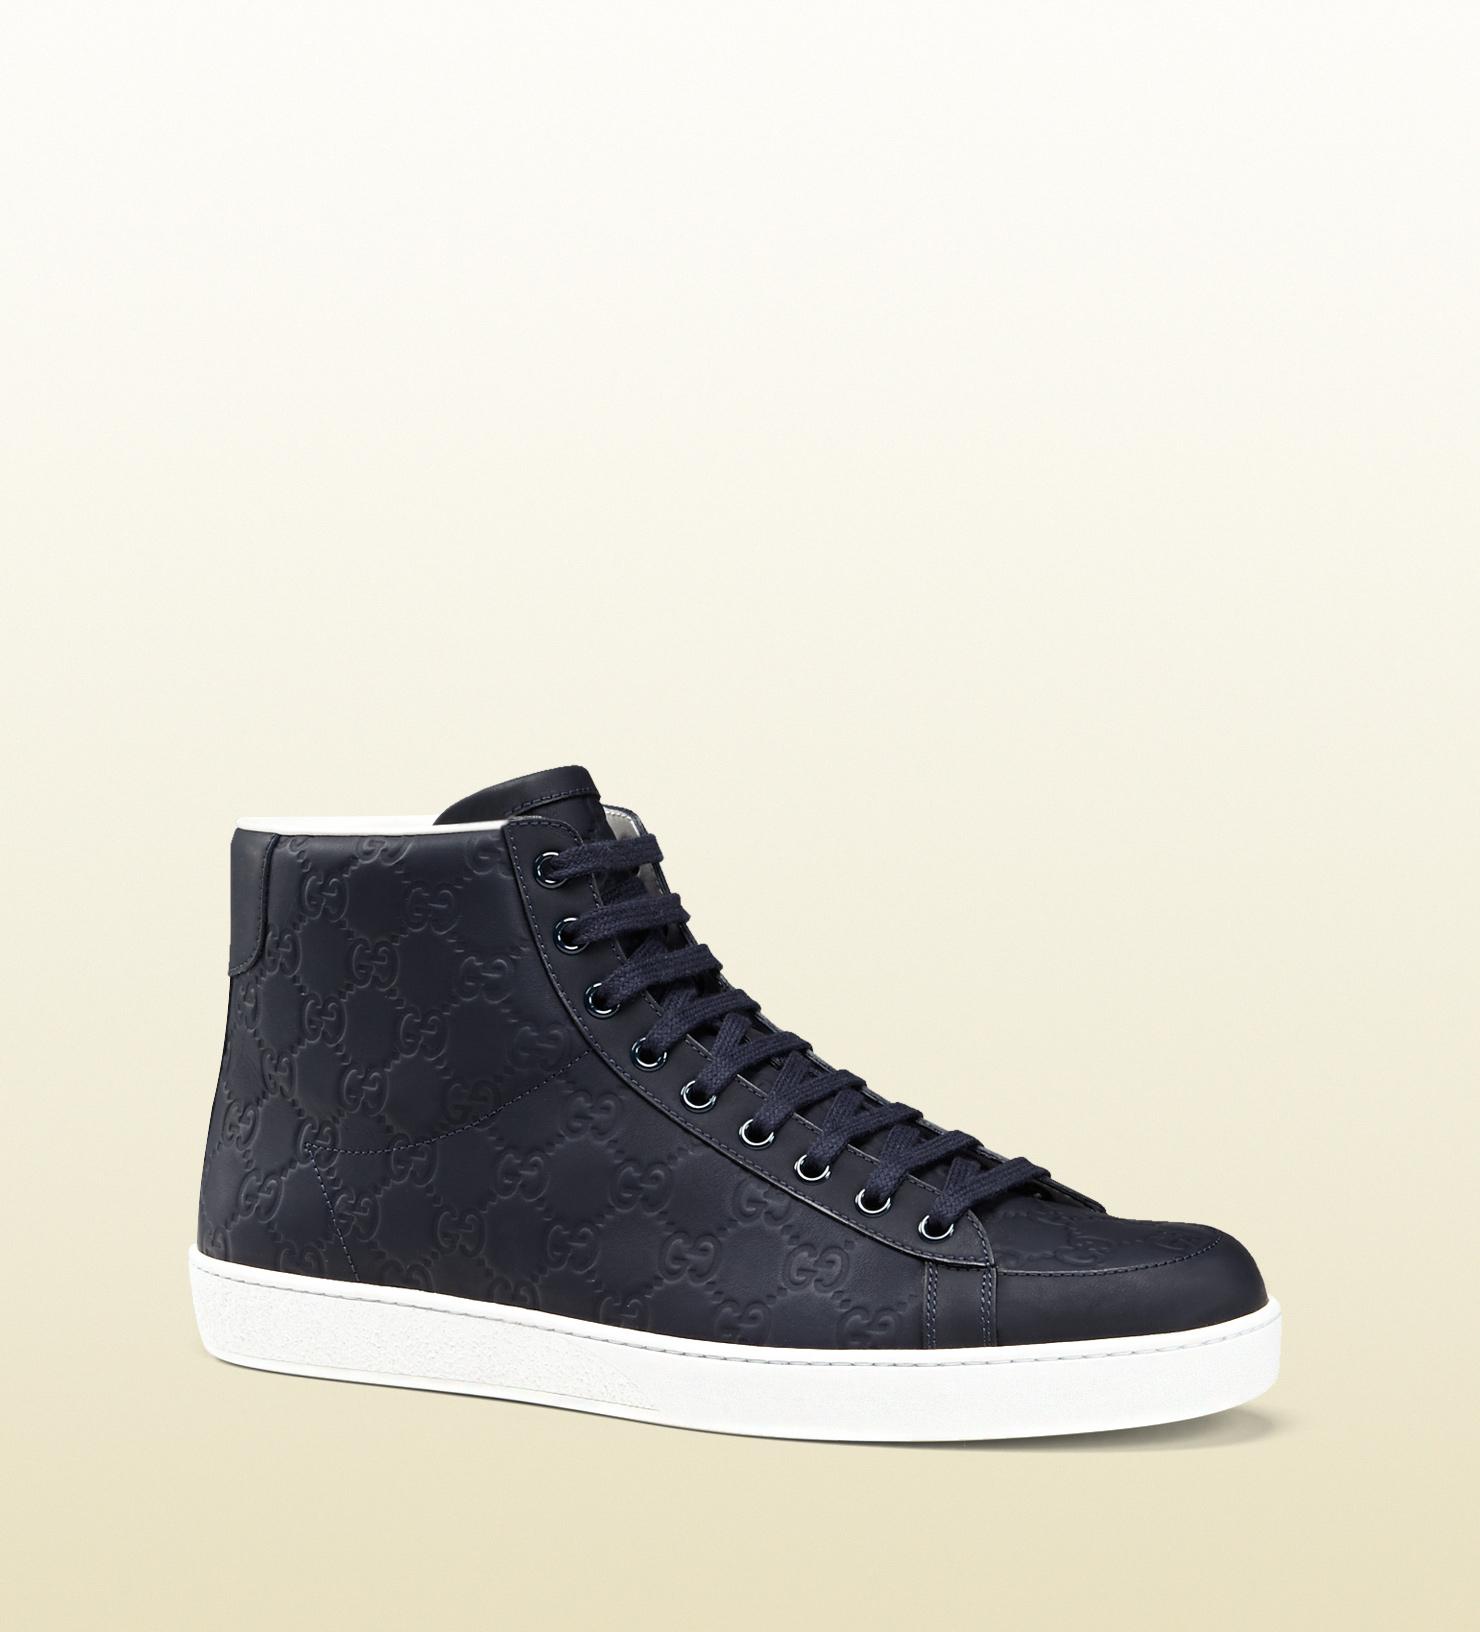 gucci rubberized leather hightop sneaker in blue for men